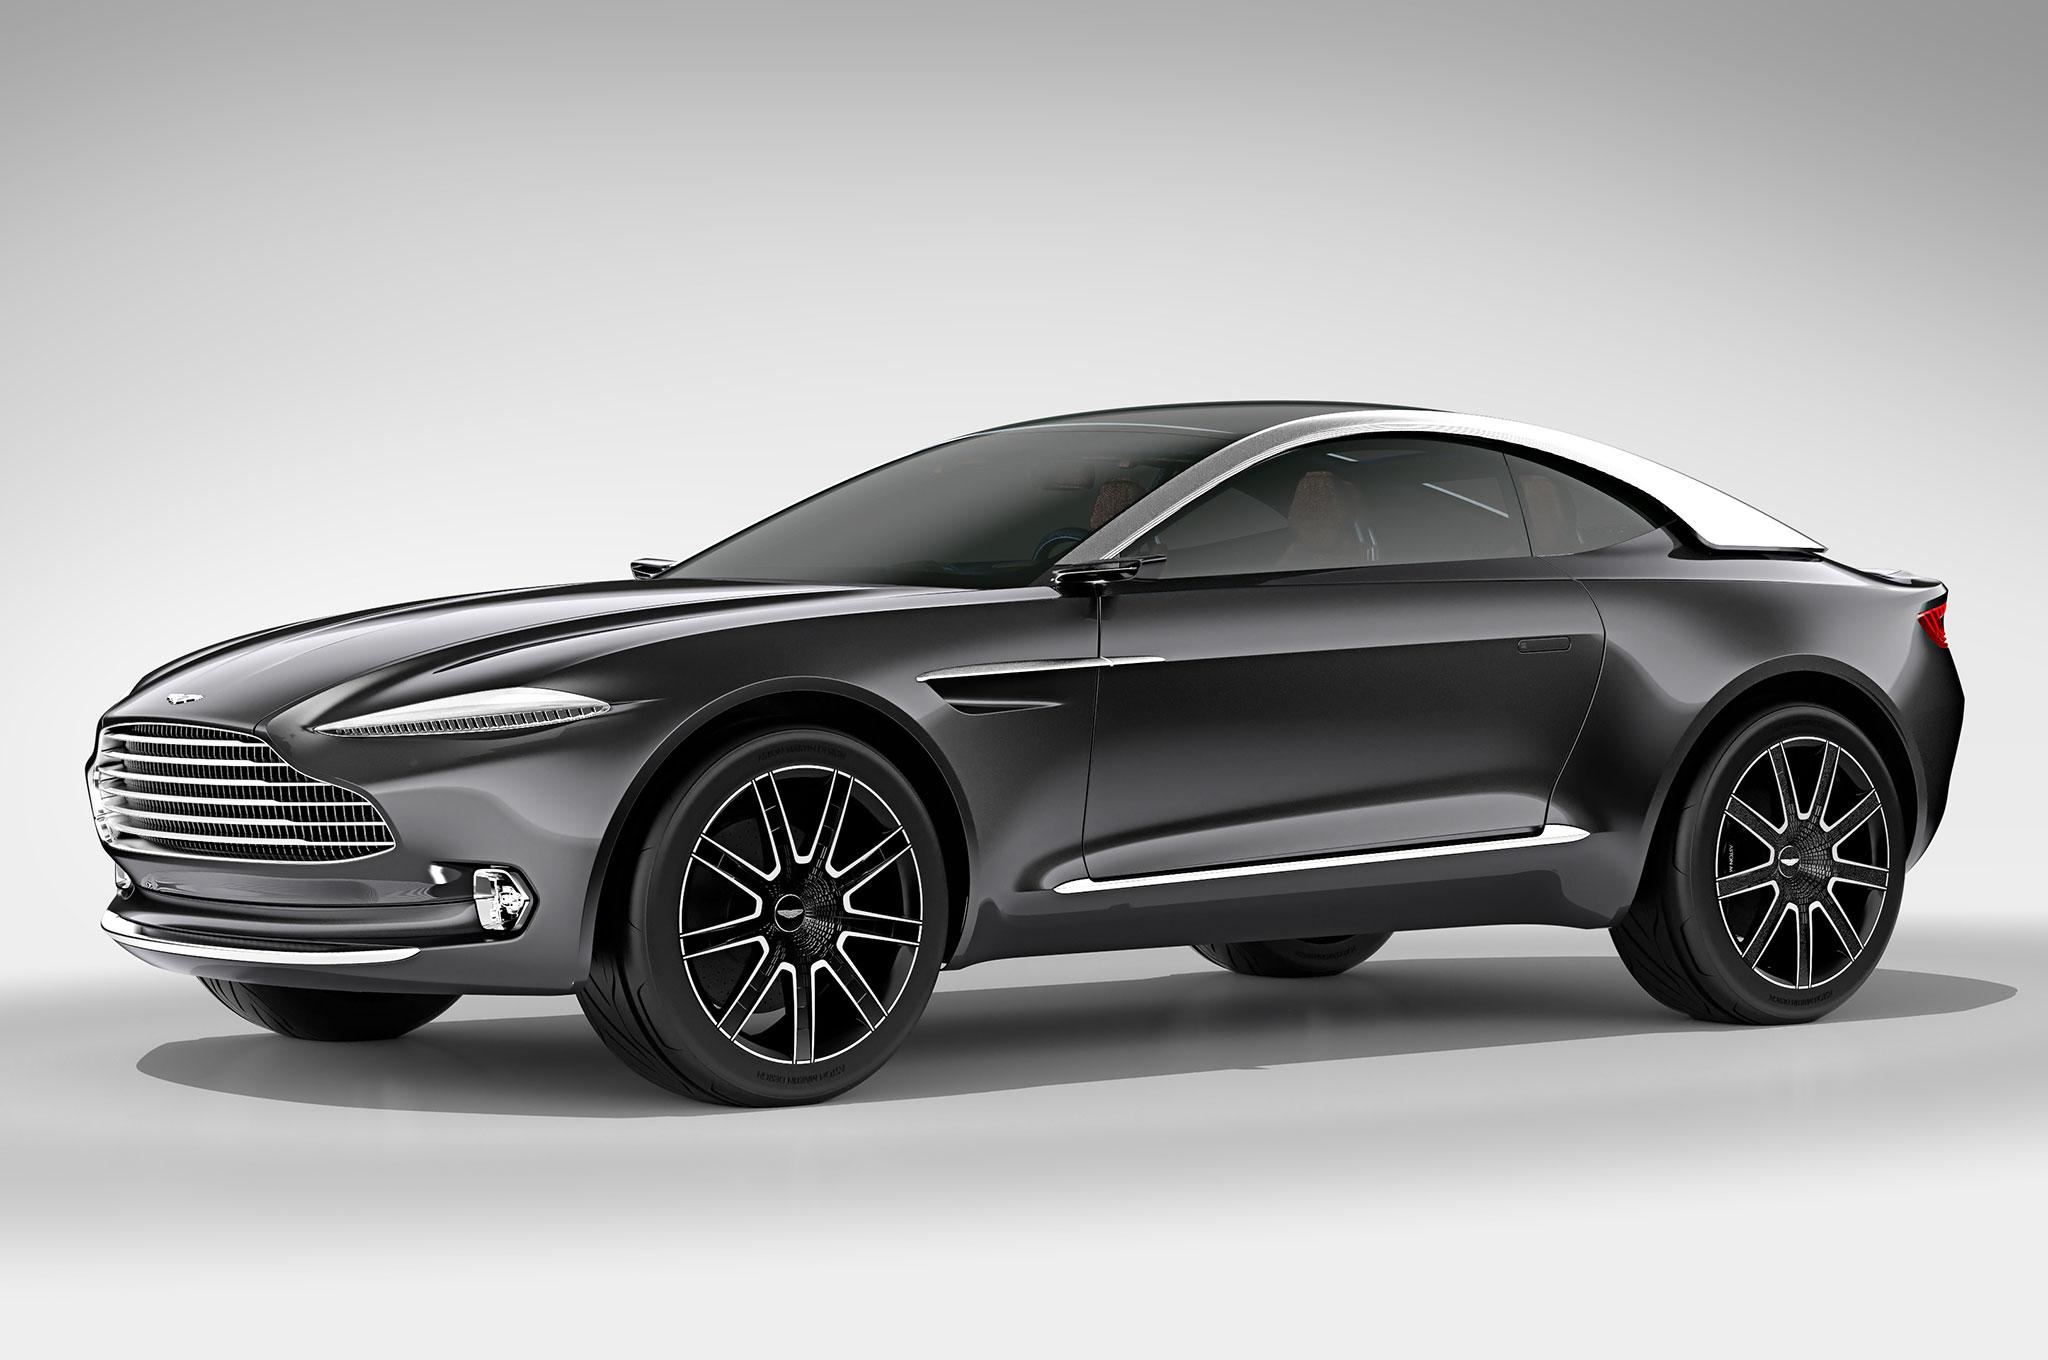 Aston Martin DBX Concept Front Three Quarter Studio